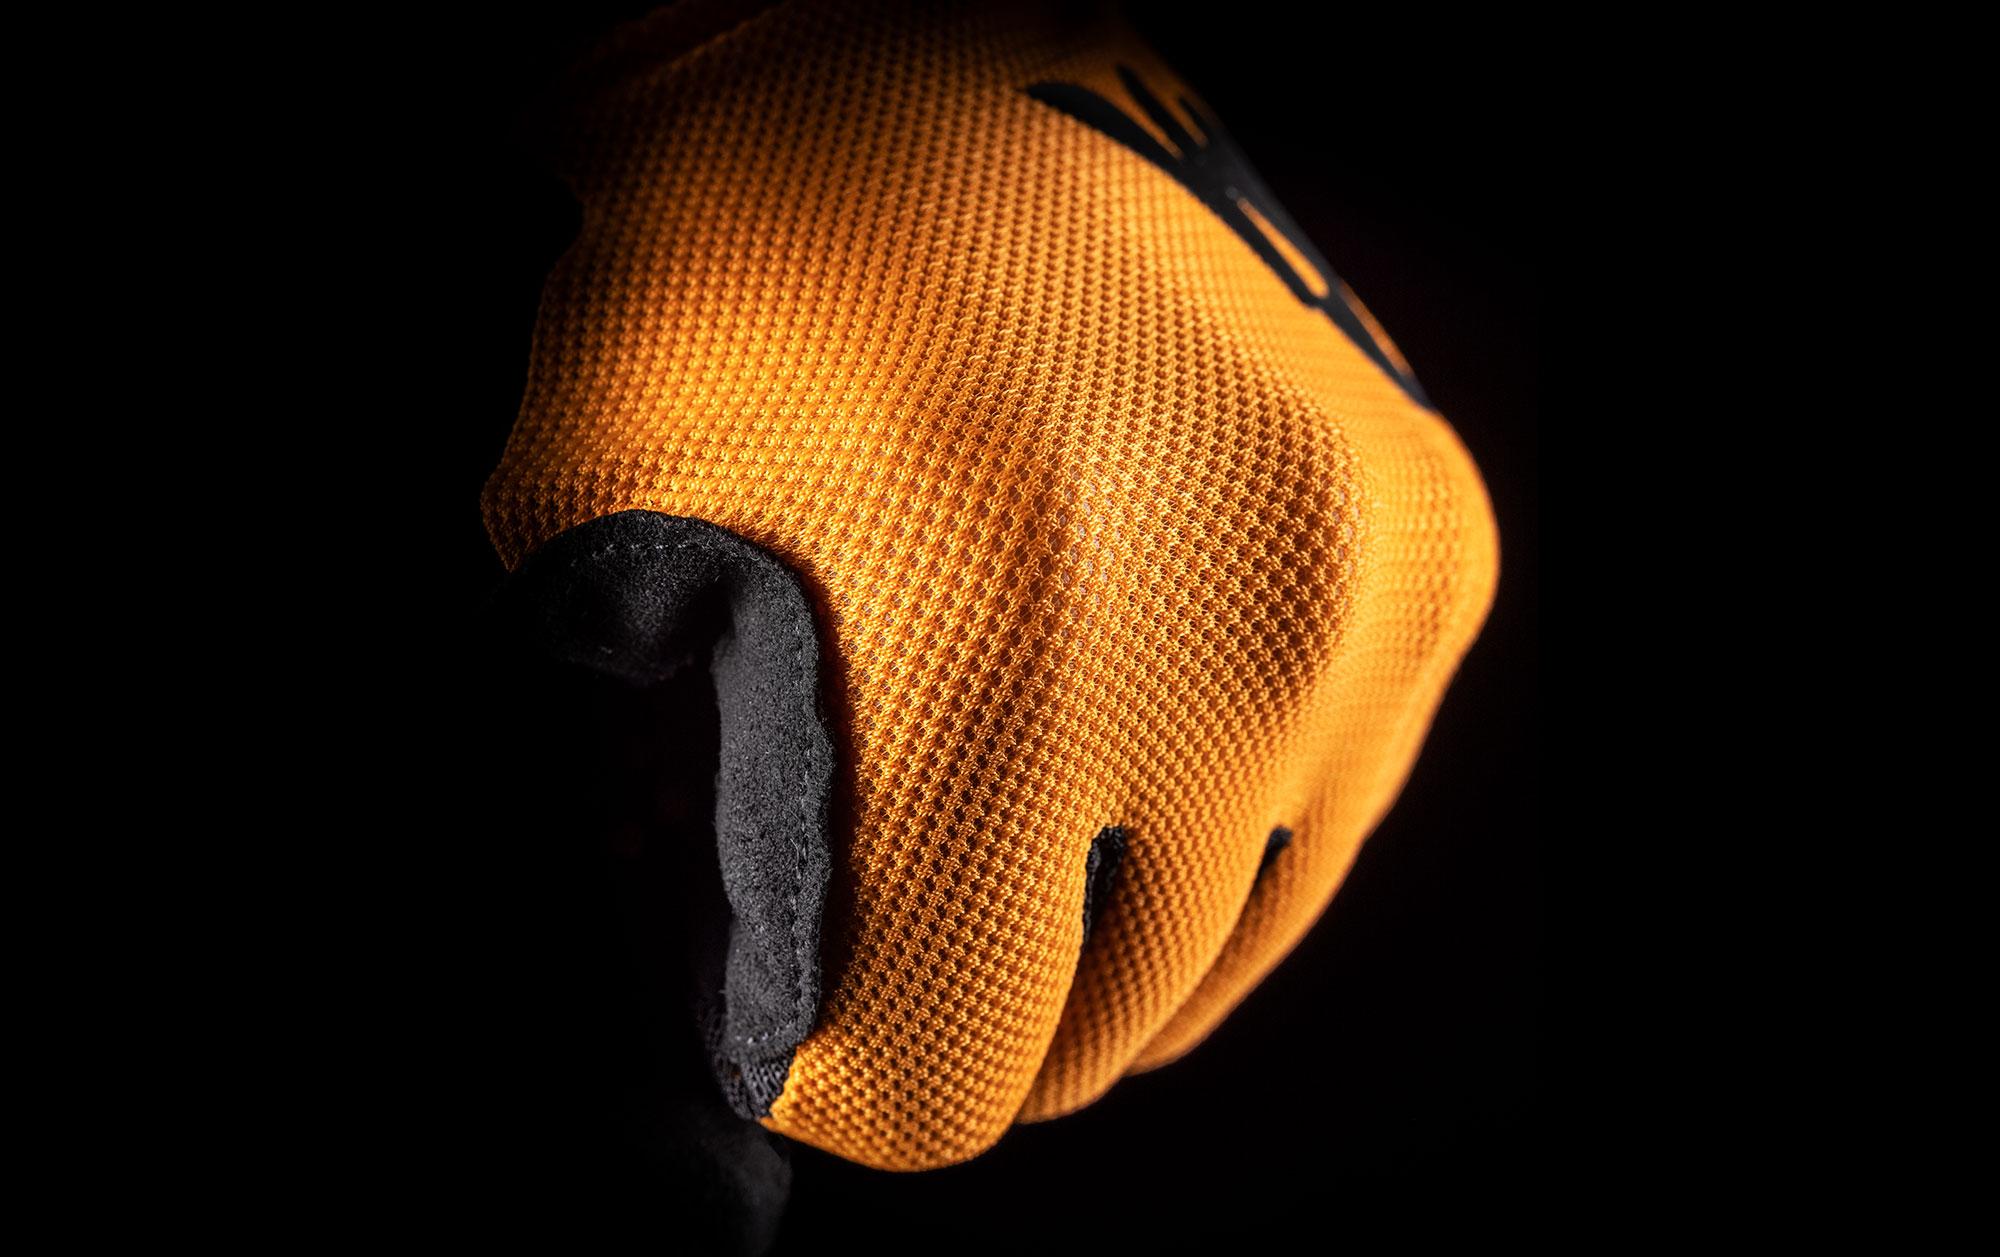 Bluegrass Union MTB Glove for DH, Trail, BMX and E-MTB